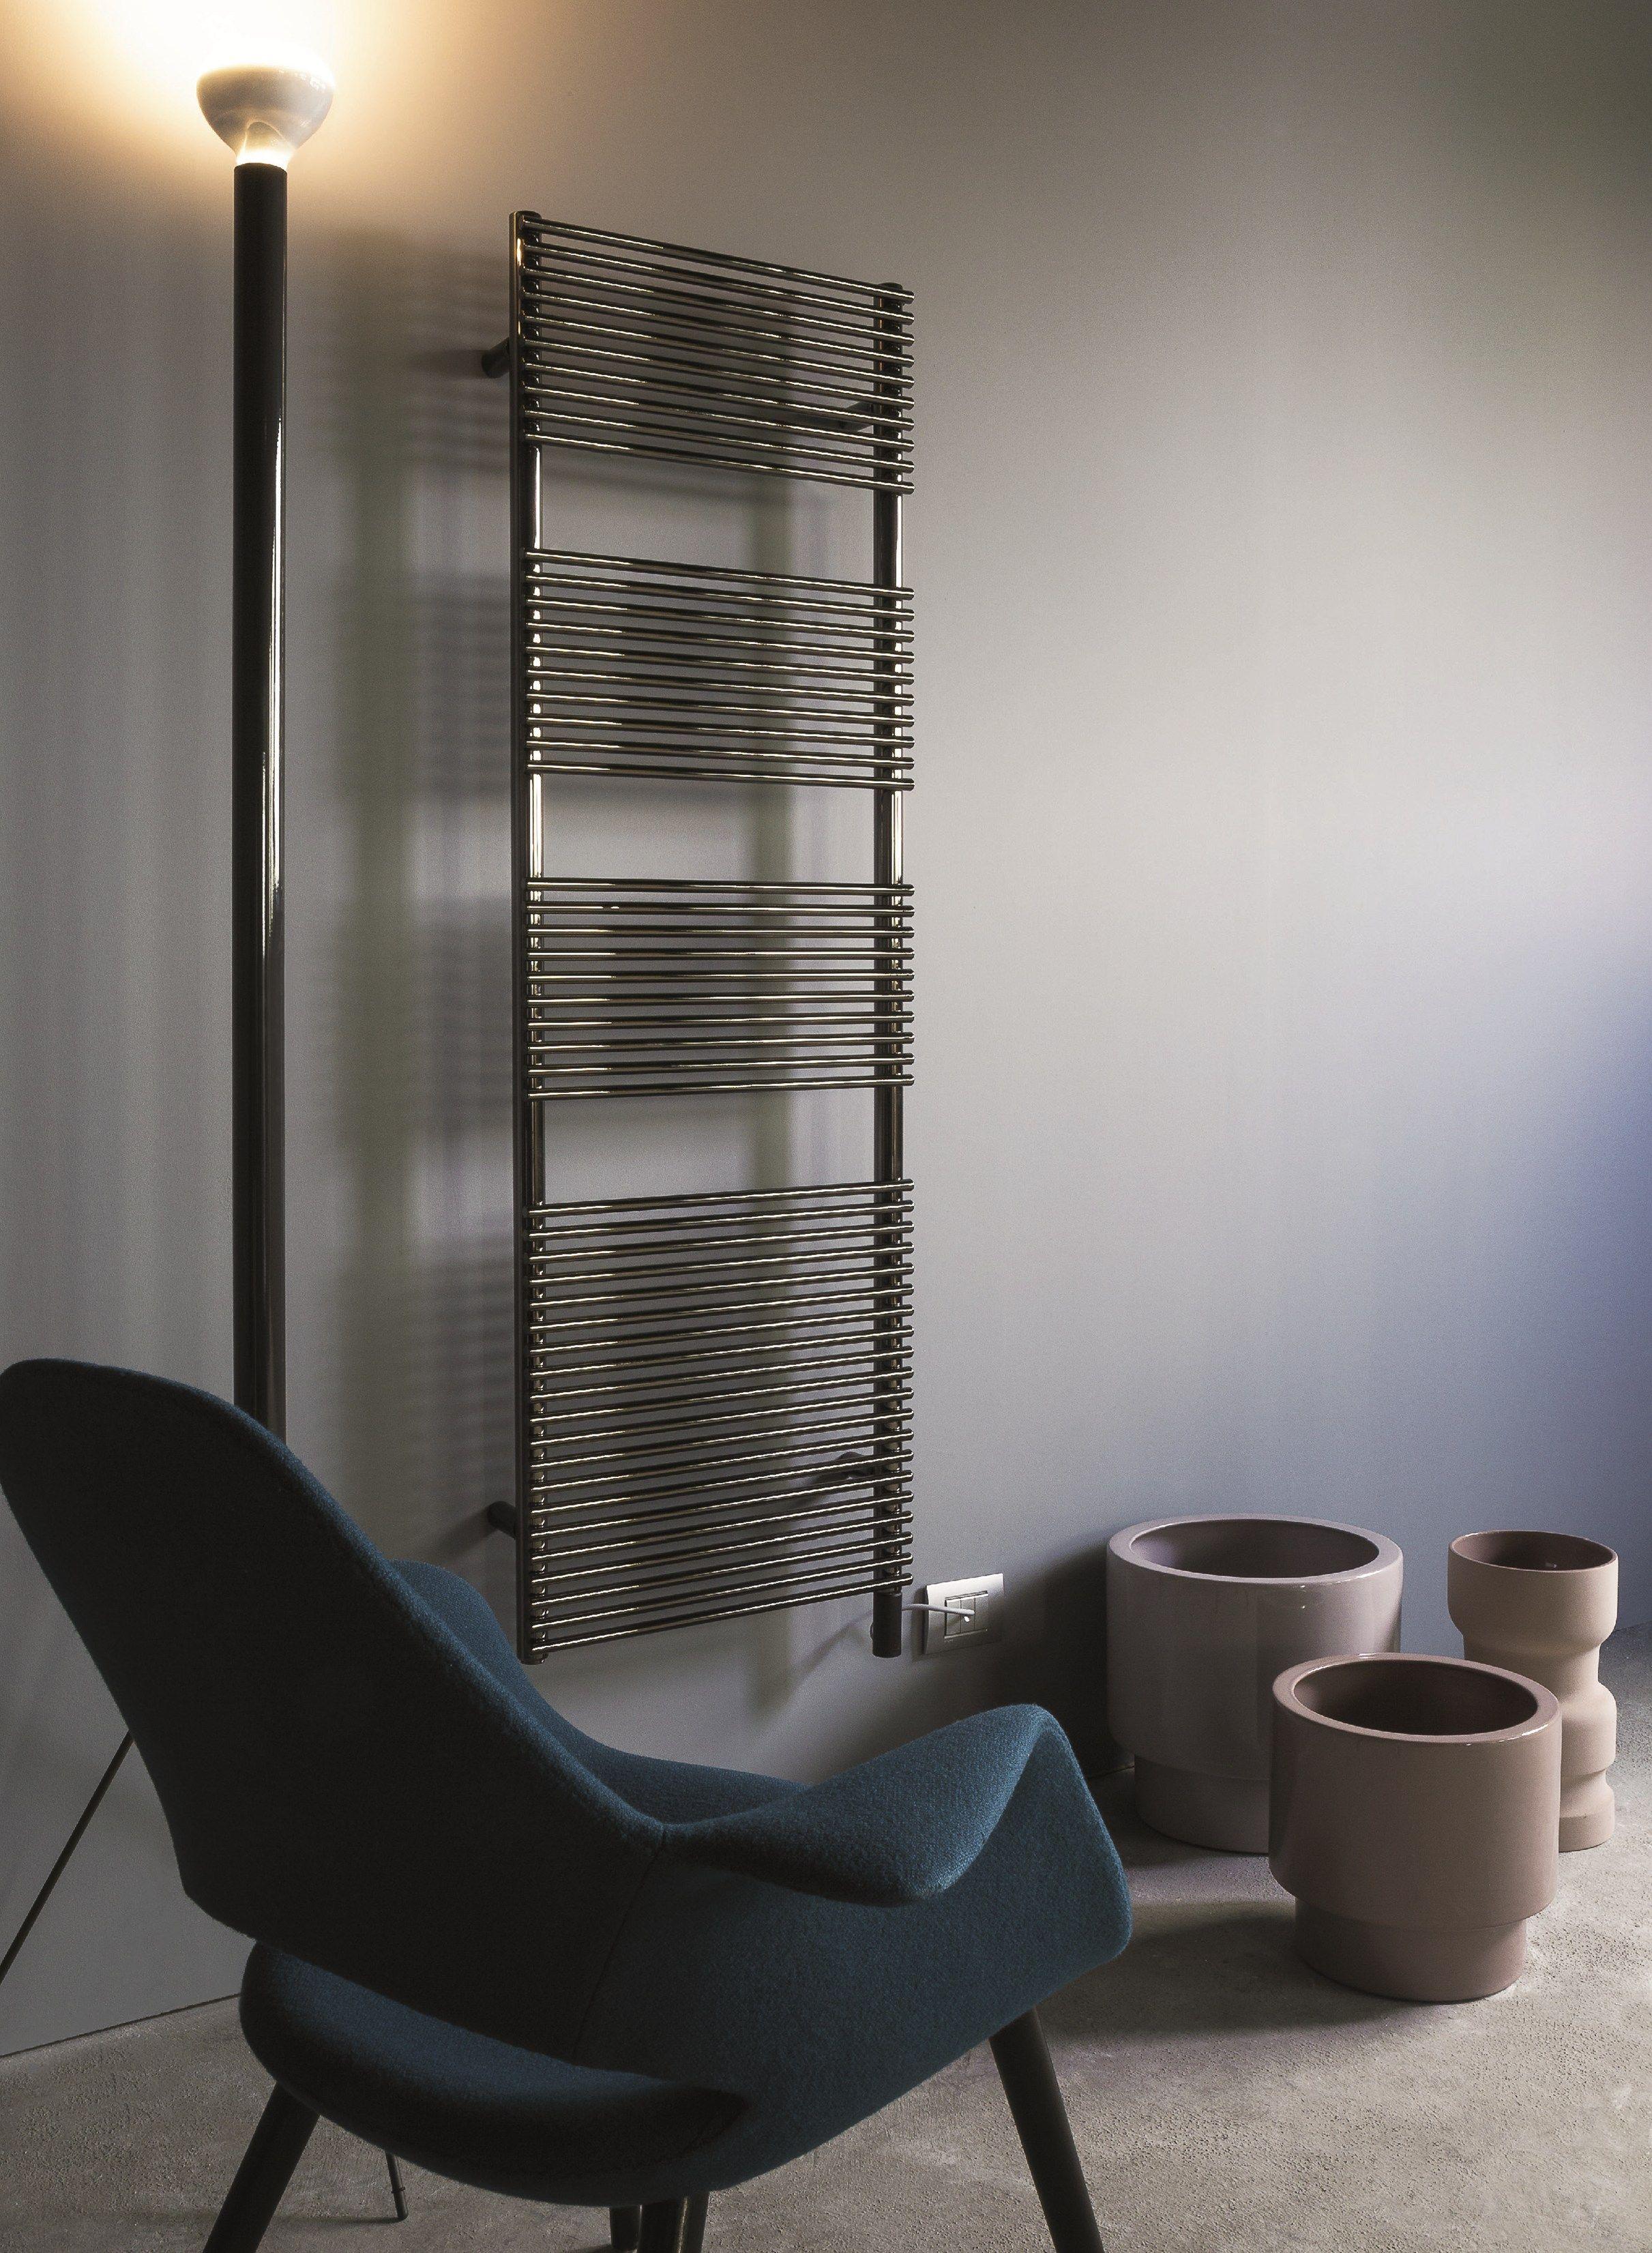 Basics 14 scaldasalviette a parete by tubes radiatori - Radiatori a parete prezzi ...